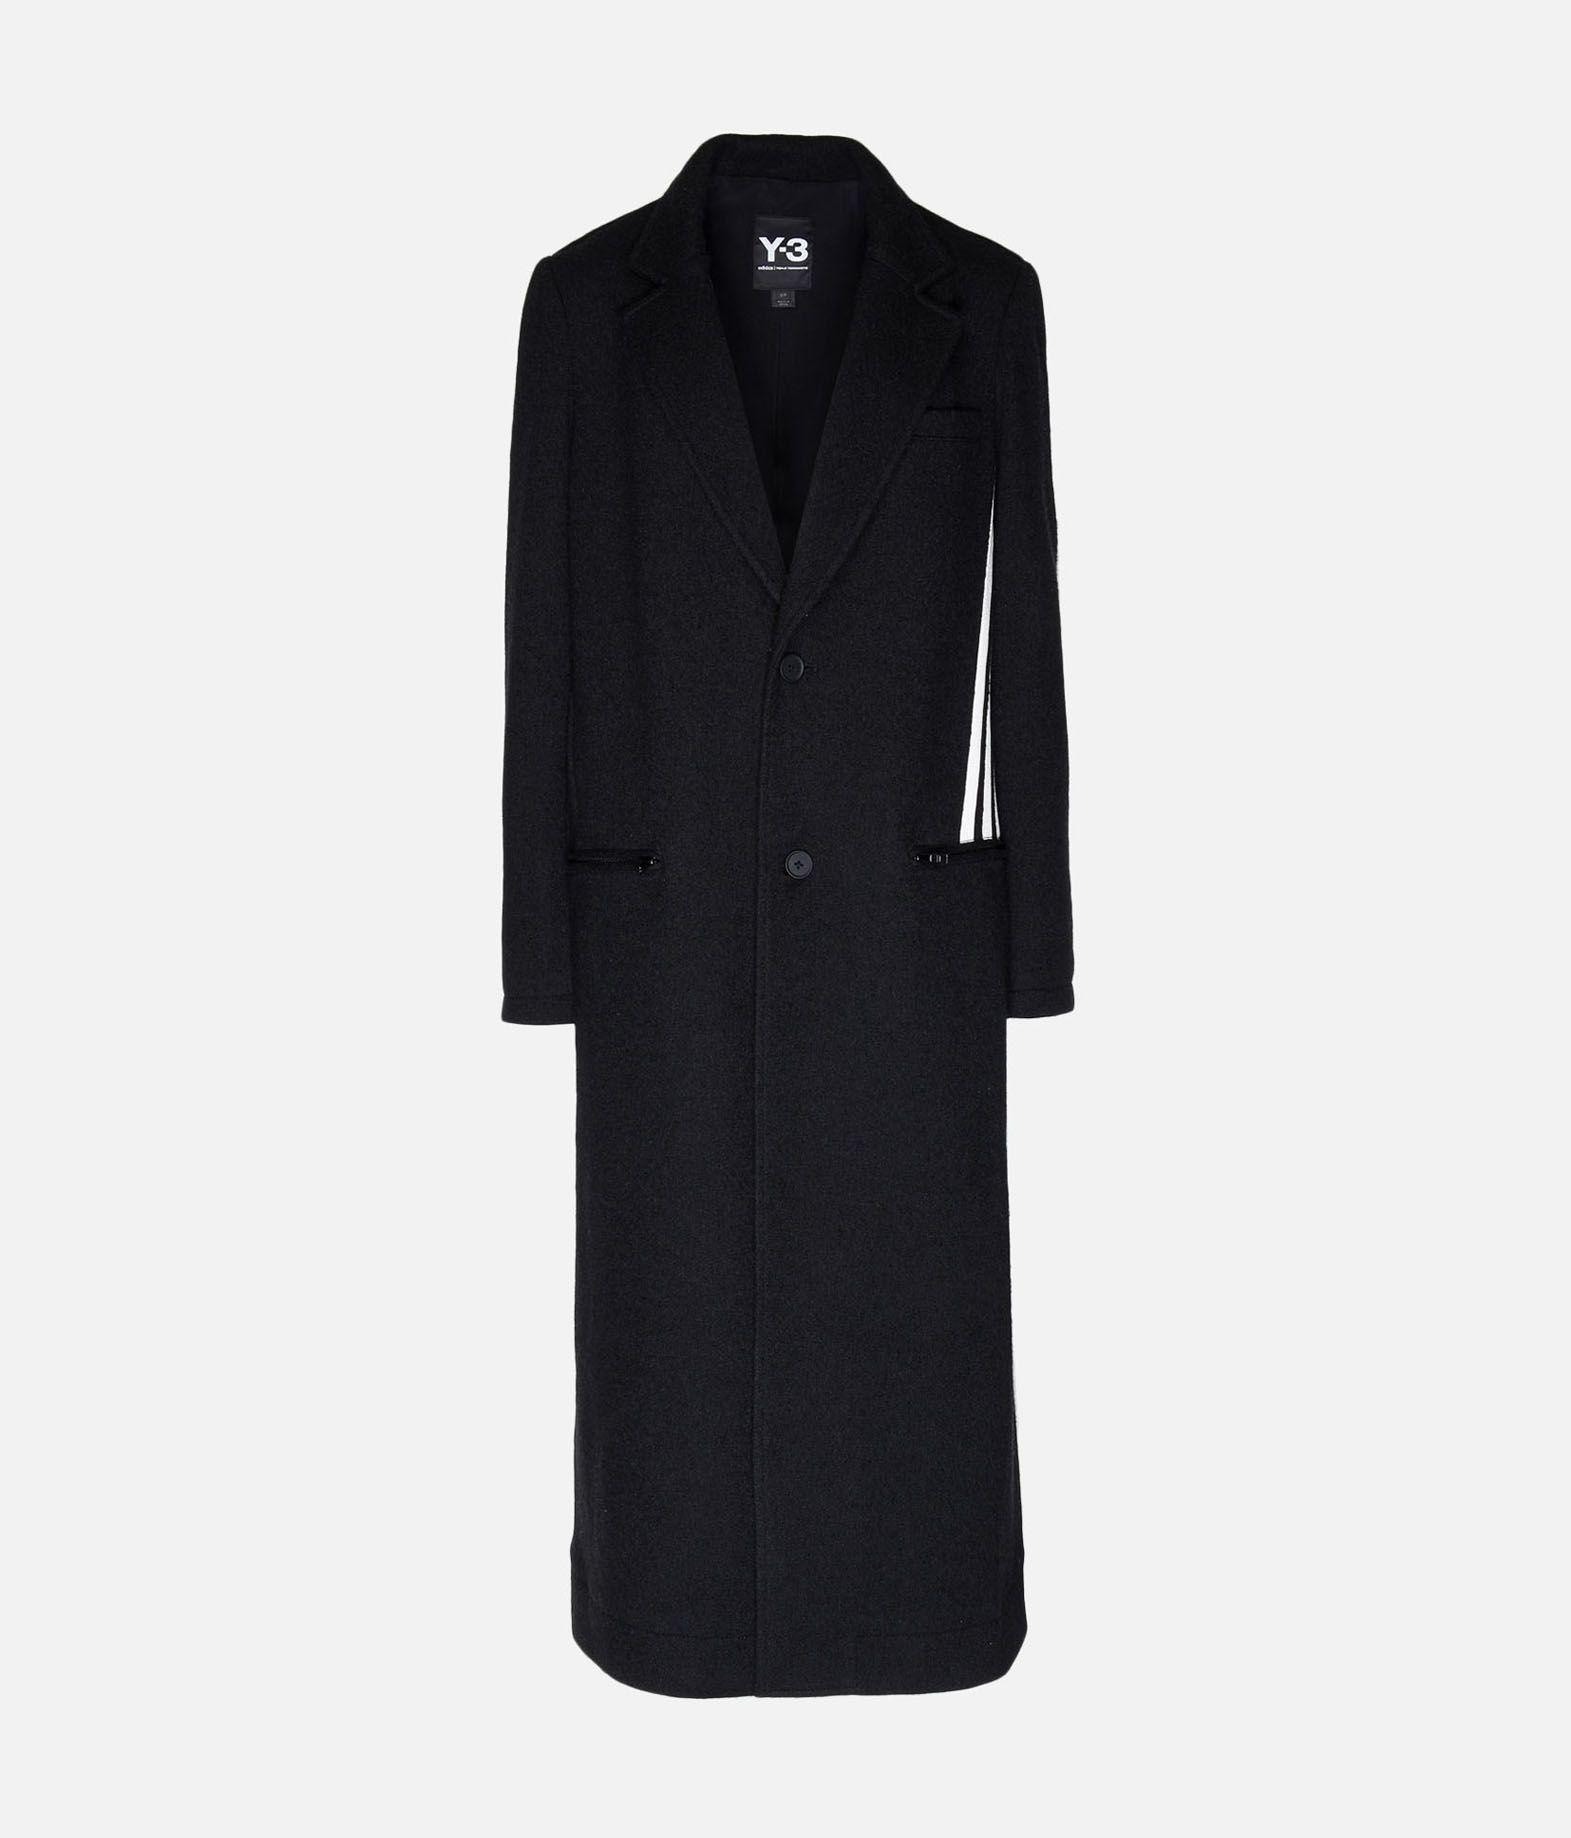 Y-3 Y-3 3-Stripes Tailored Wool Coat Blazer Damen f